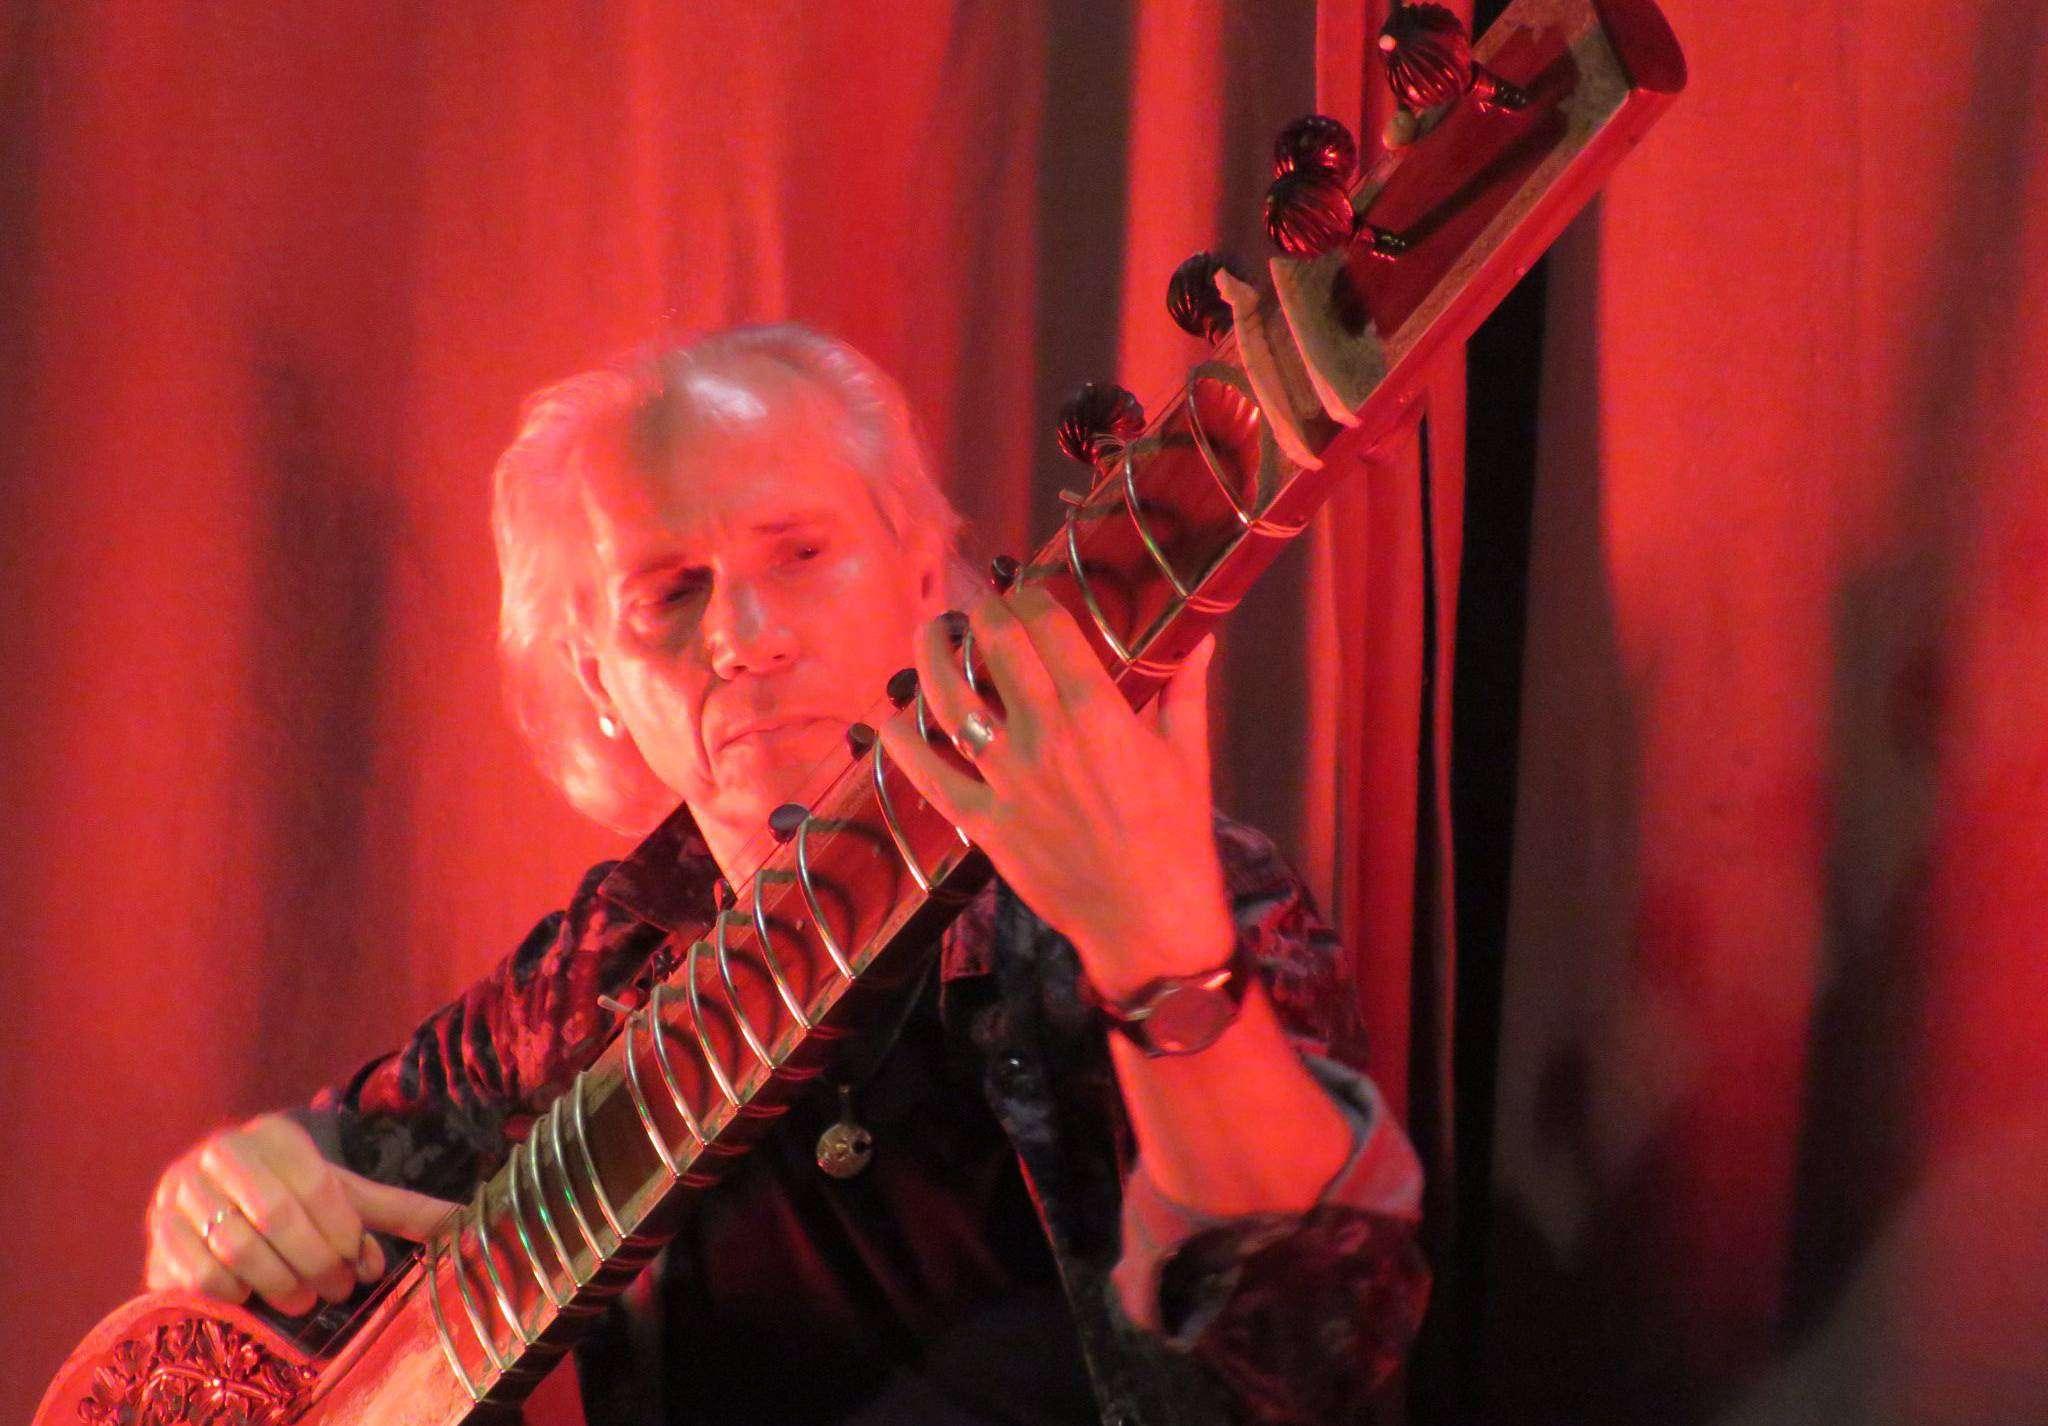 Harry Payuta trat mit Nob Welsh und Band im Bergwerk auf. Foto: Elke Keppler-Rosenau